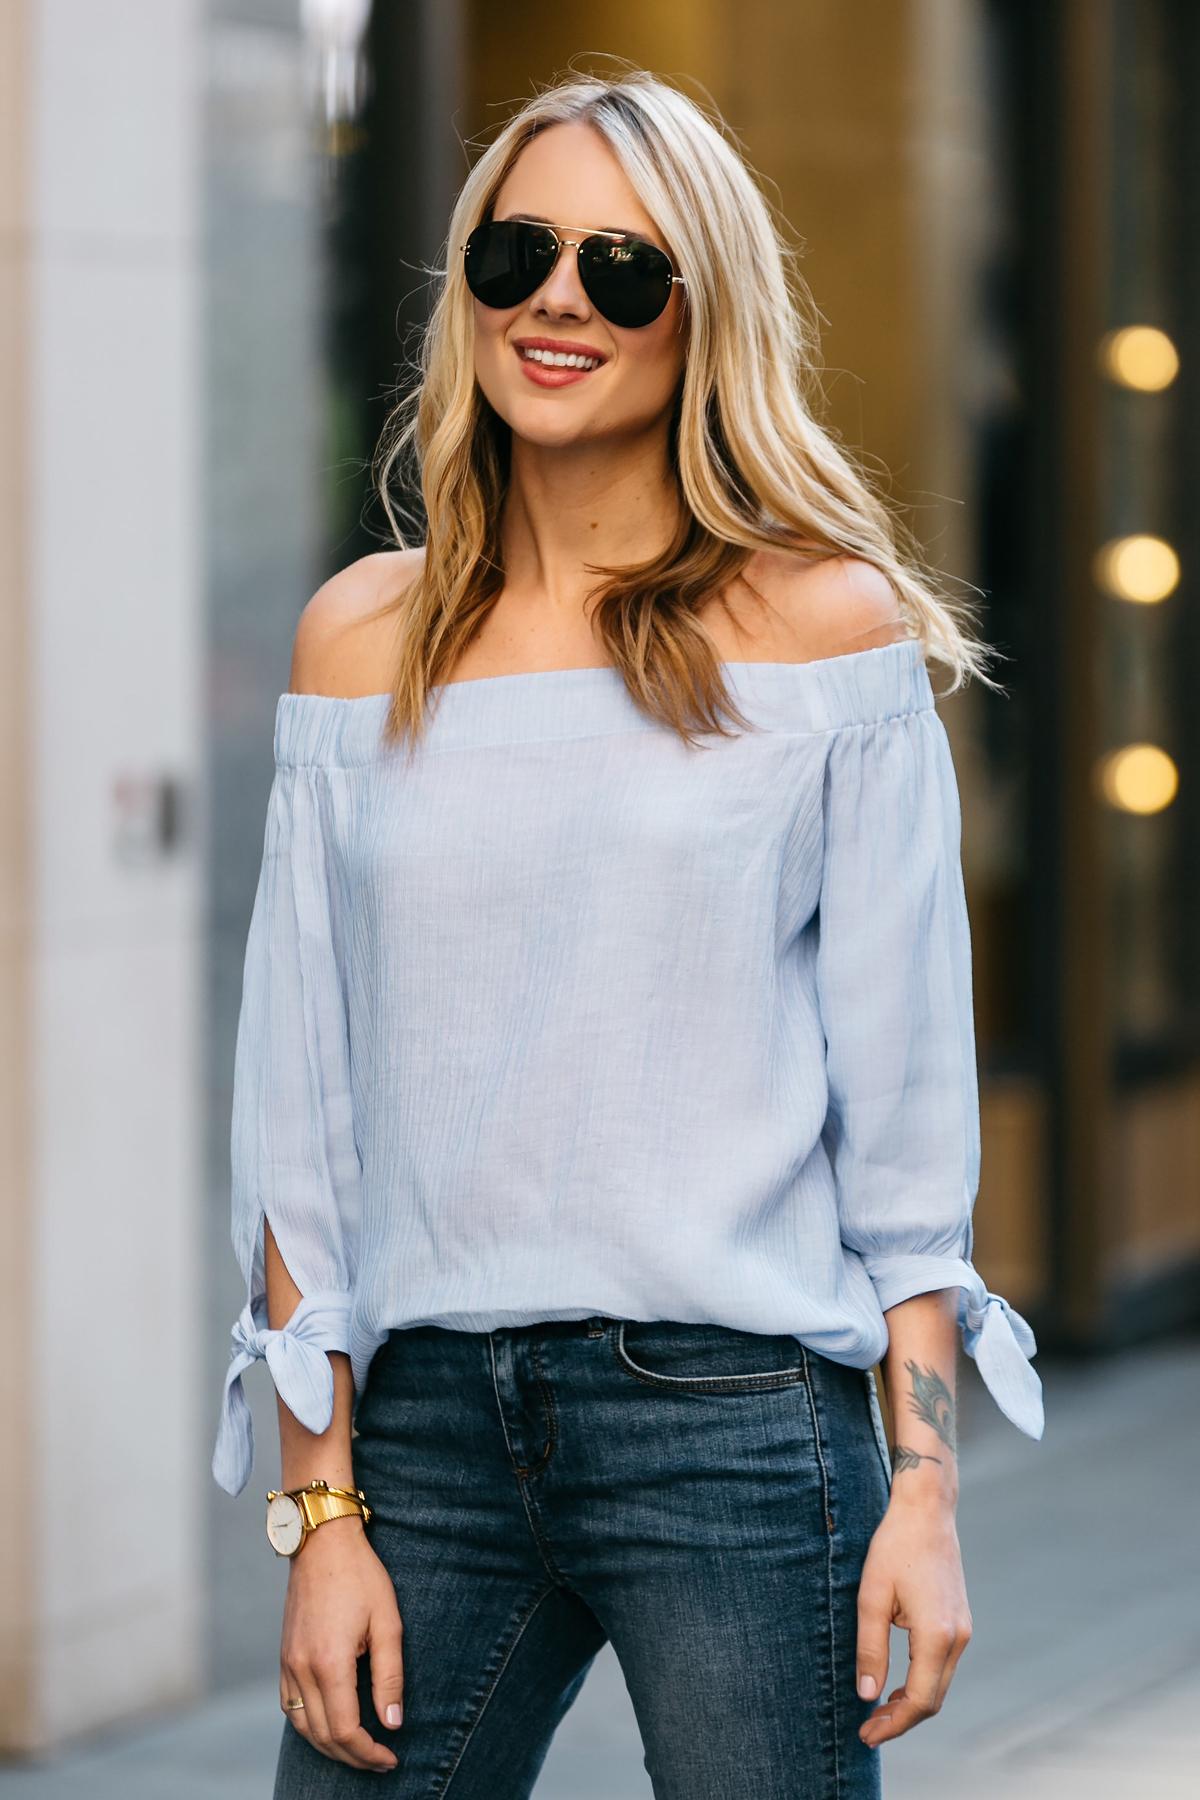 Fashion Jackson, Dallas Blogger, Fashion Blogger, Street Style, Ann Taylor Blue Tie Off-the-shoulder Top, Denim Skinny Jeans, Celine Aviator Sunglasses